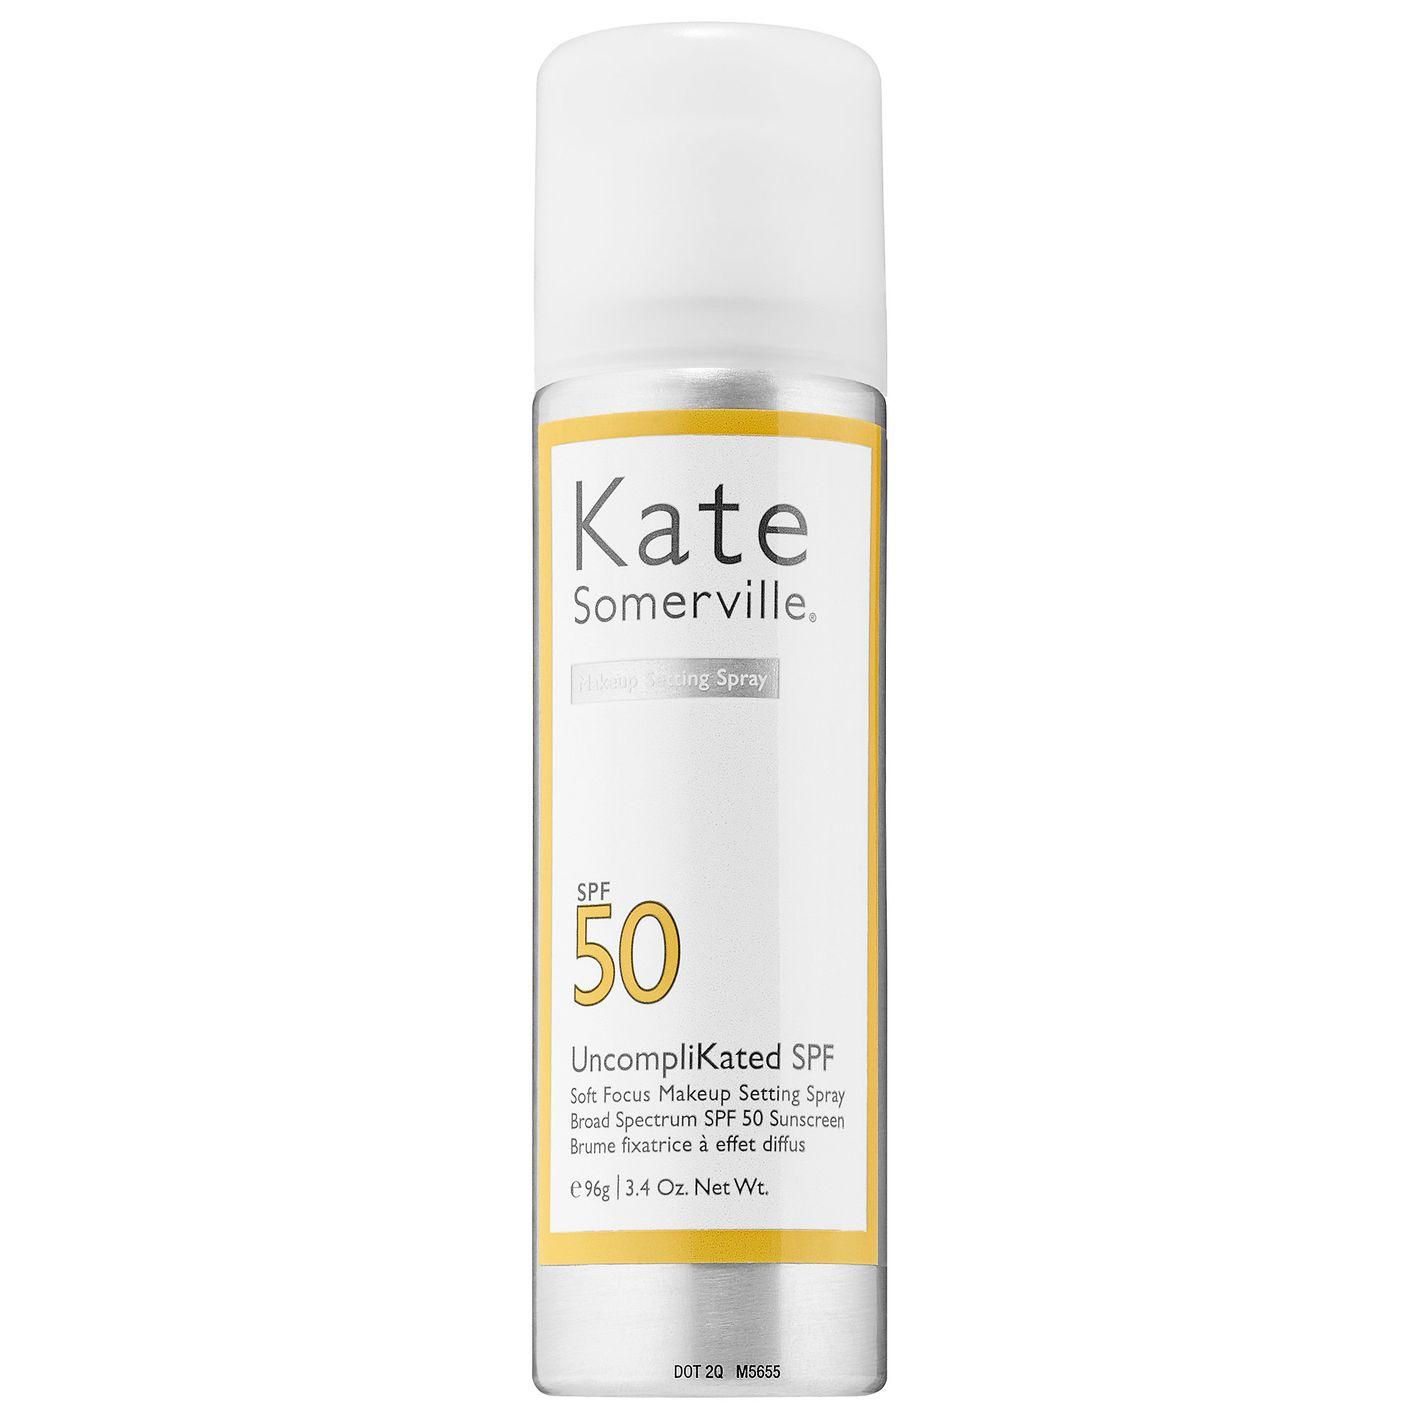 Kate Somerville UncompliKated SPF Soft Focus Makeup Setting Spray Broad Spectrum SPF 50 Sunscreen,